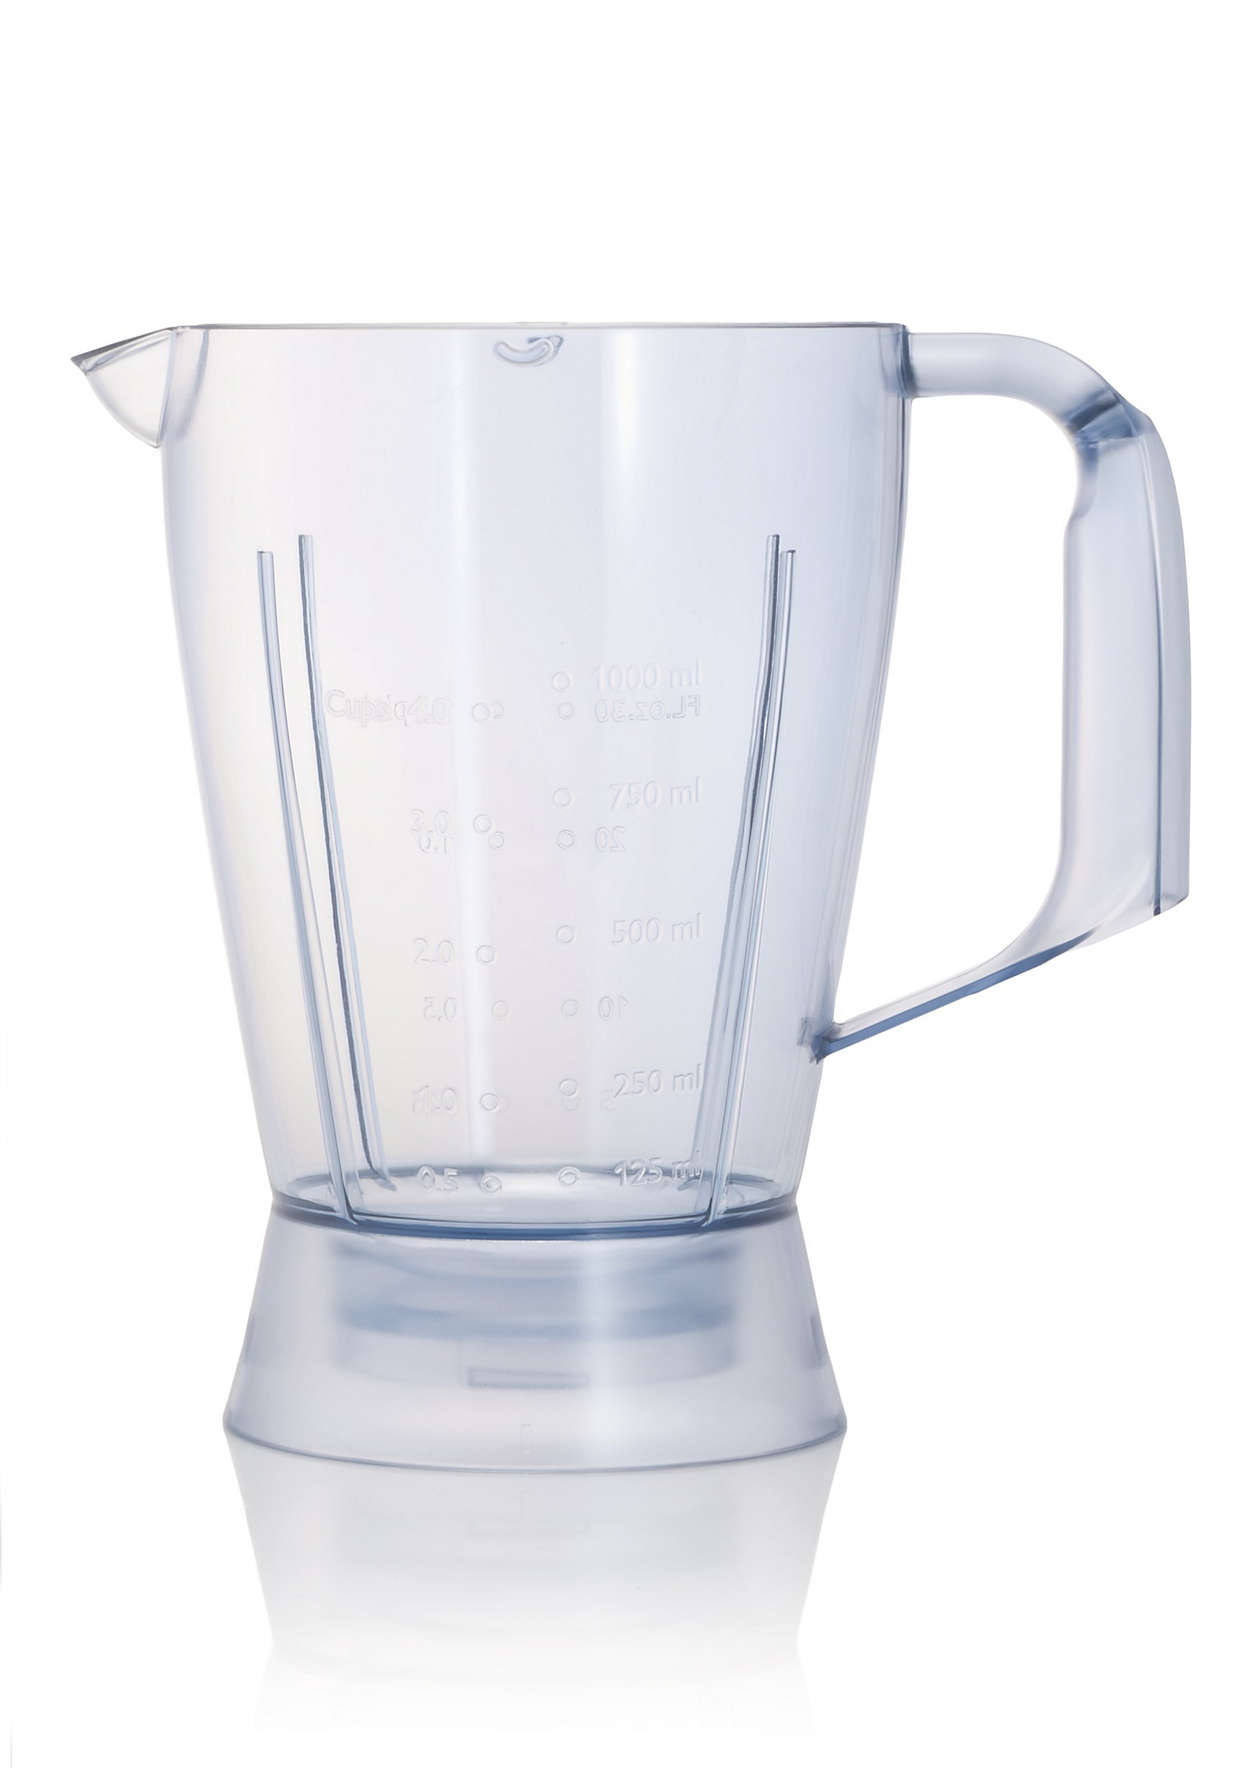 Vaso frullatore crp574 01 philips - Robot da cucina philips essence ...